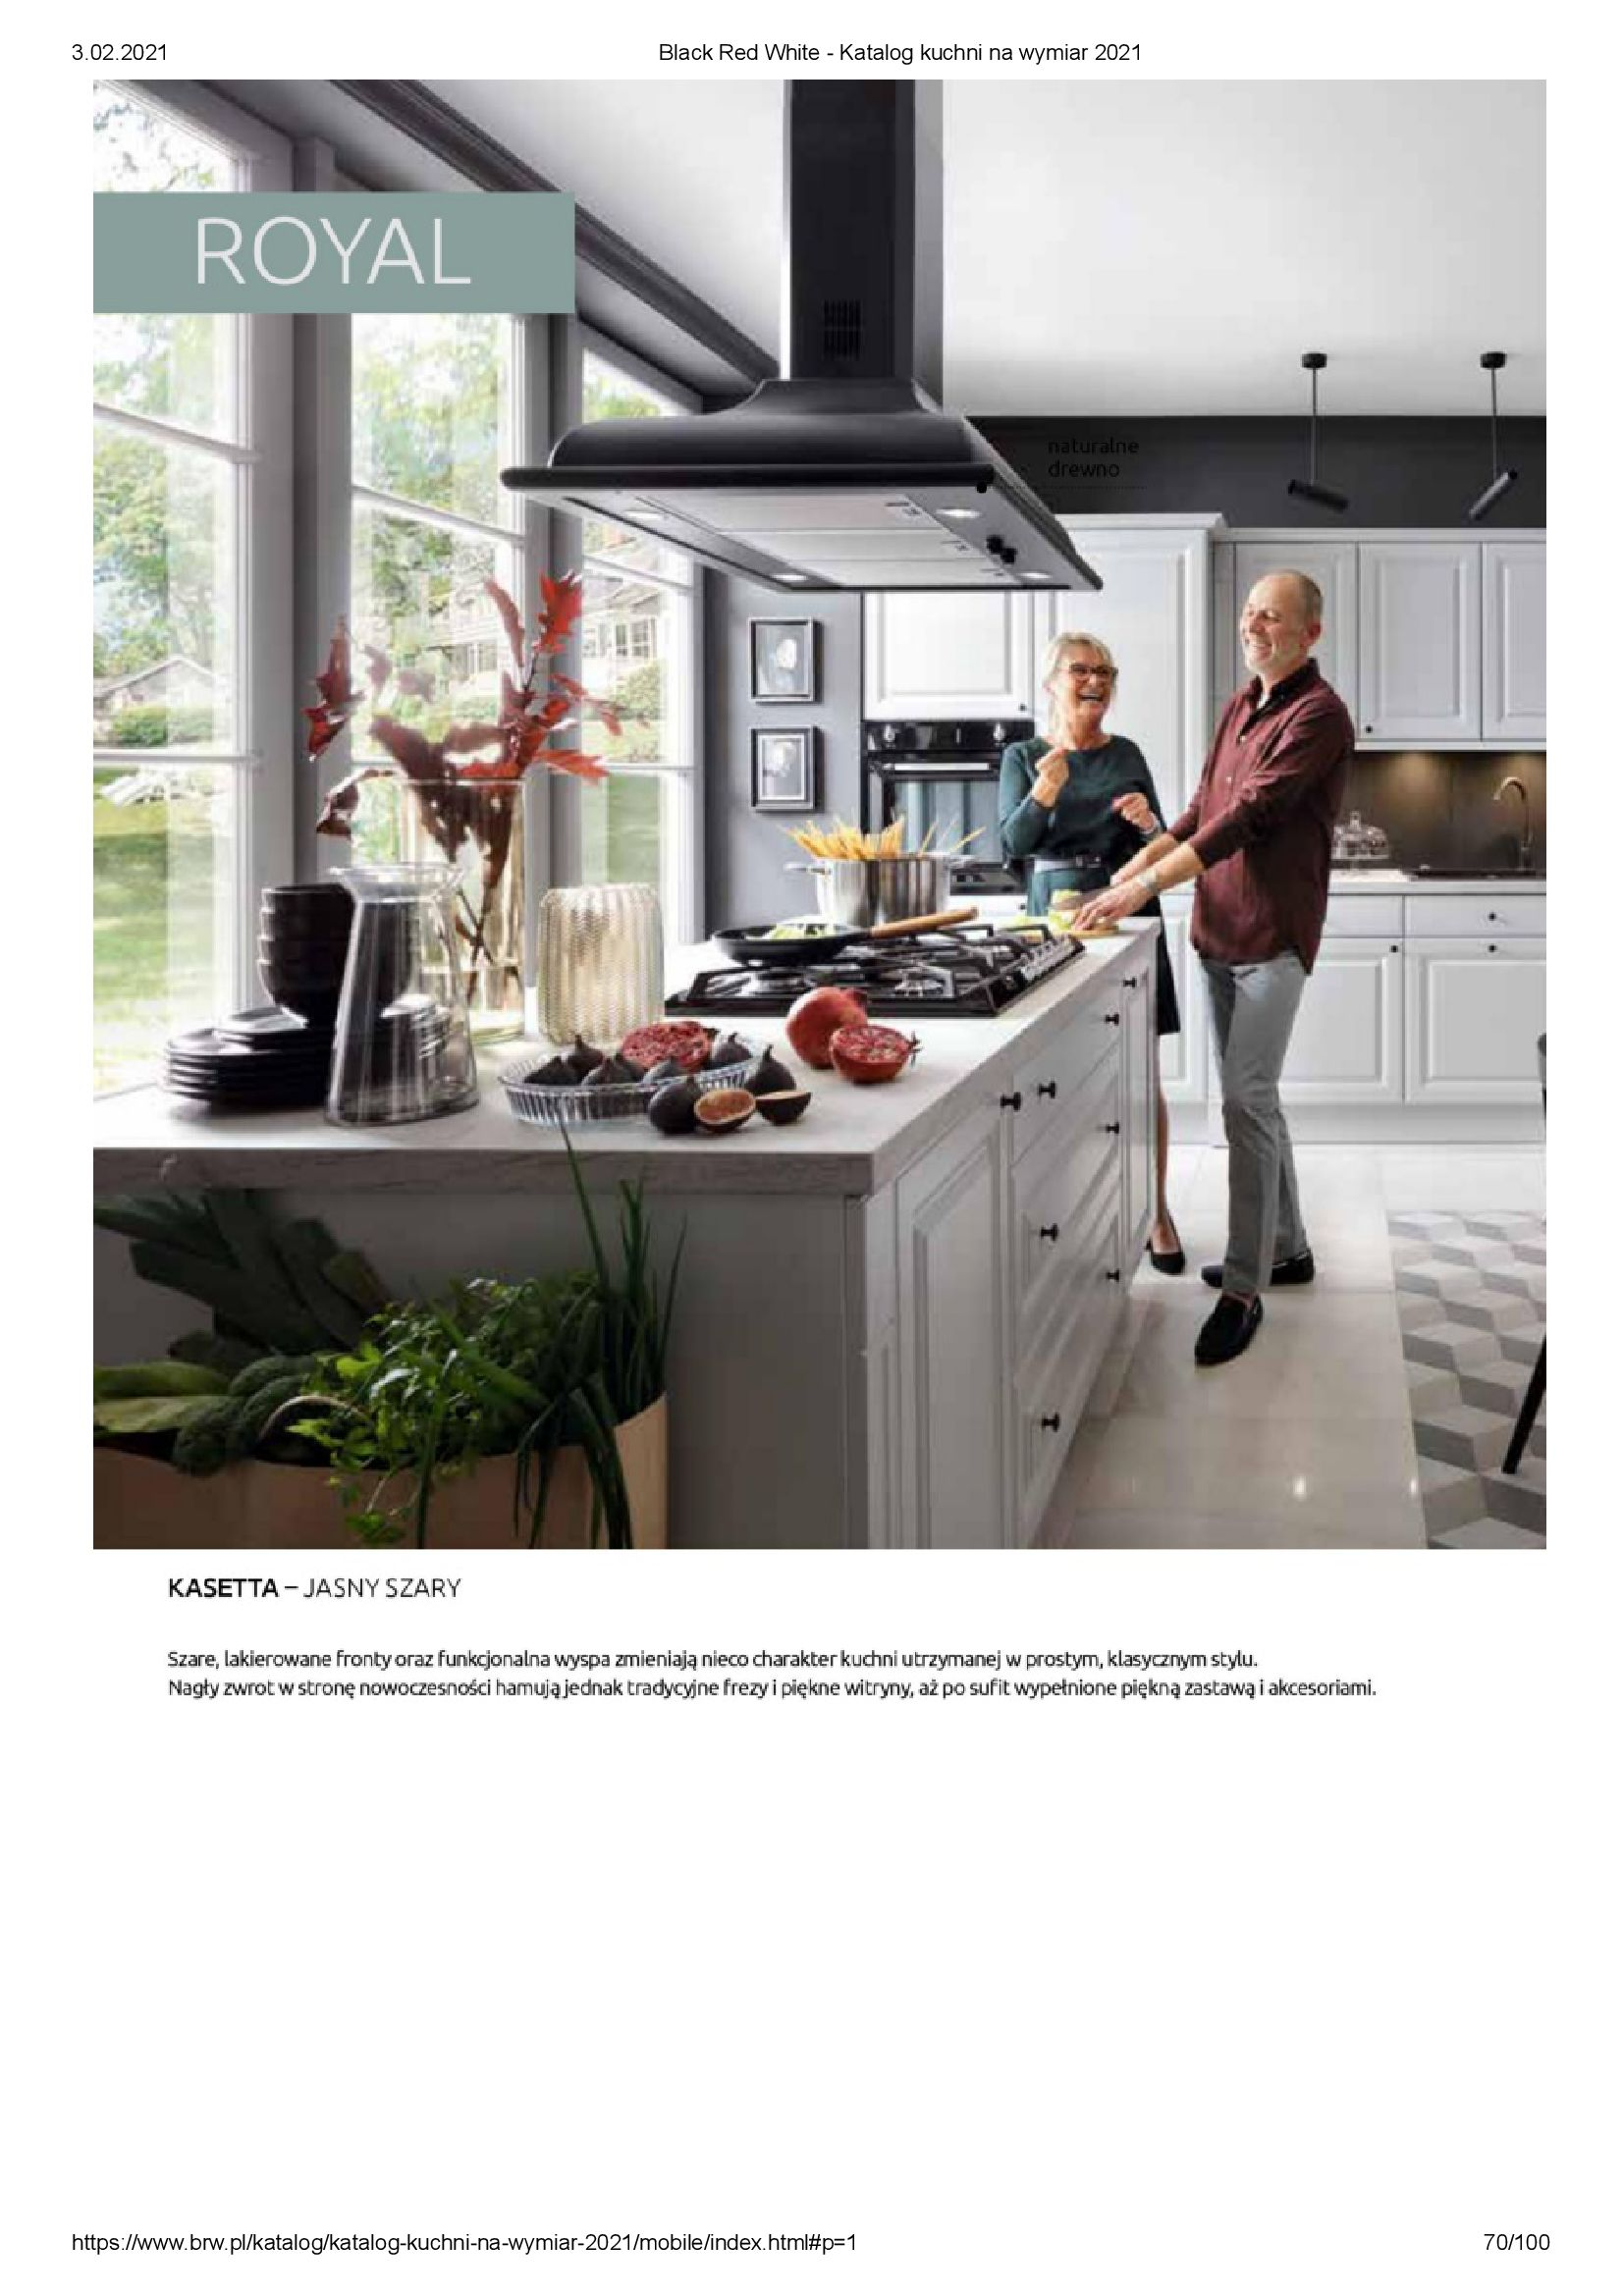 Gazetka Black Red White: Katalog - Kuchnie na wymiar Senso Kitchens 2021 2021-01-01 page-70